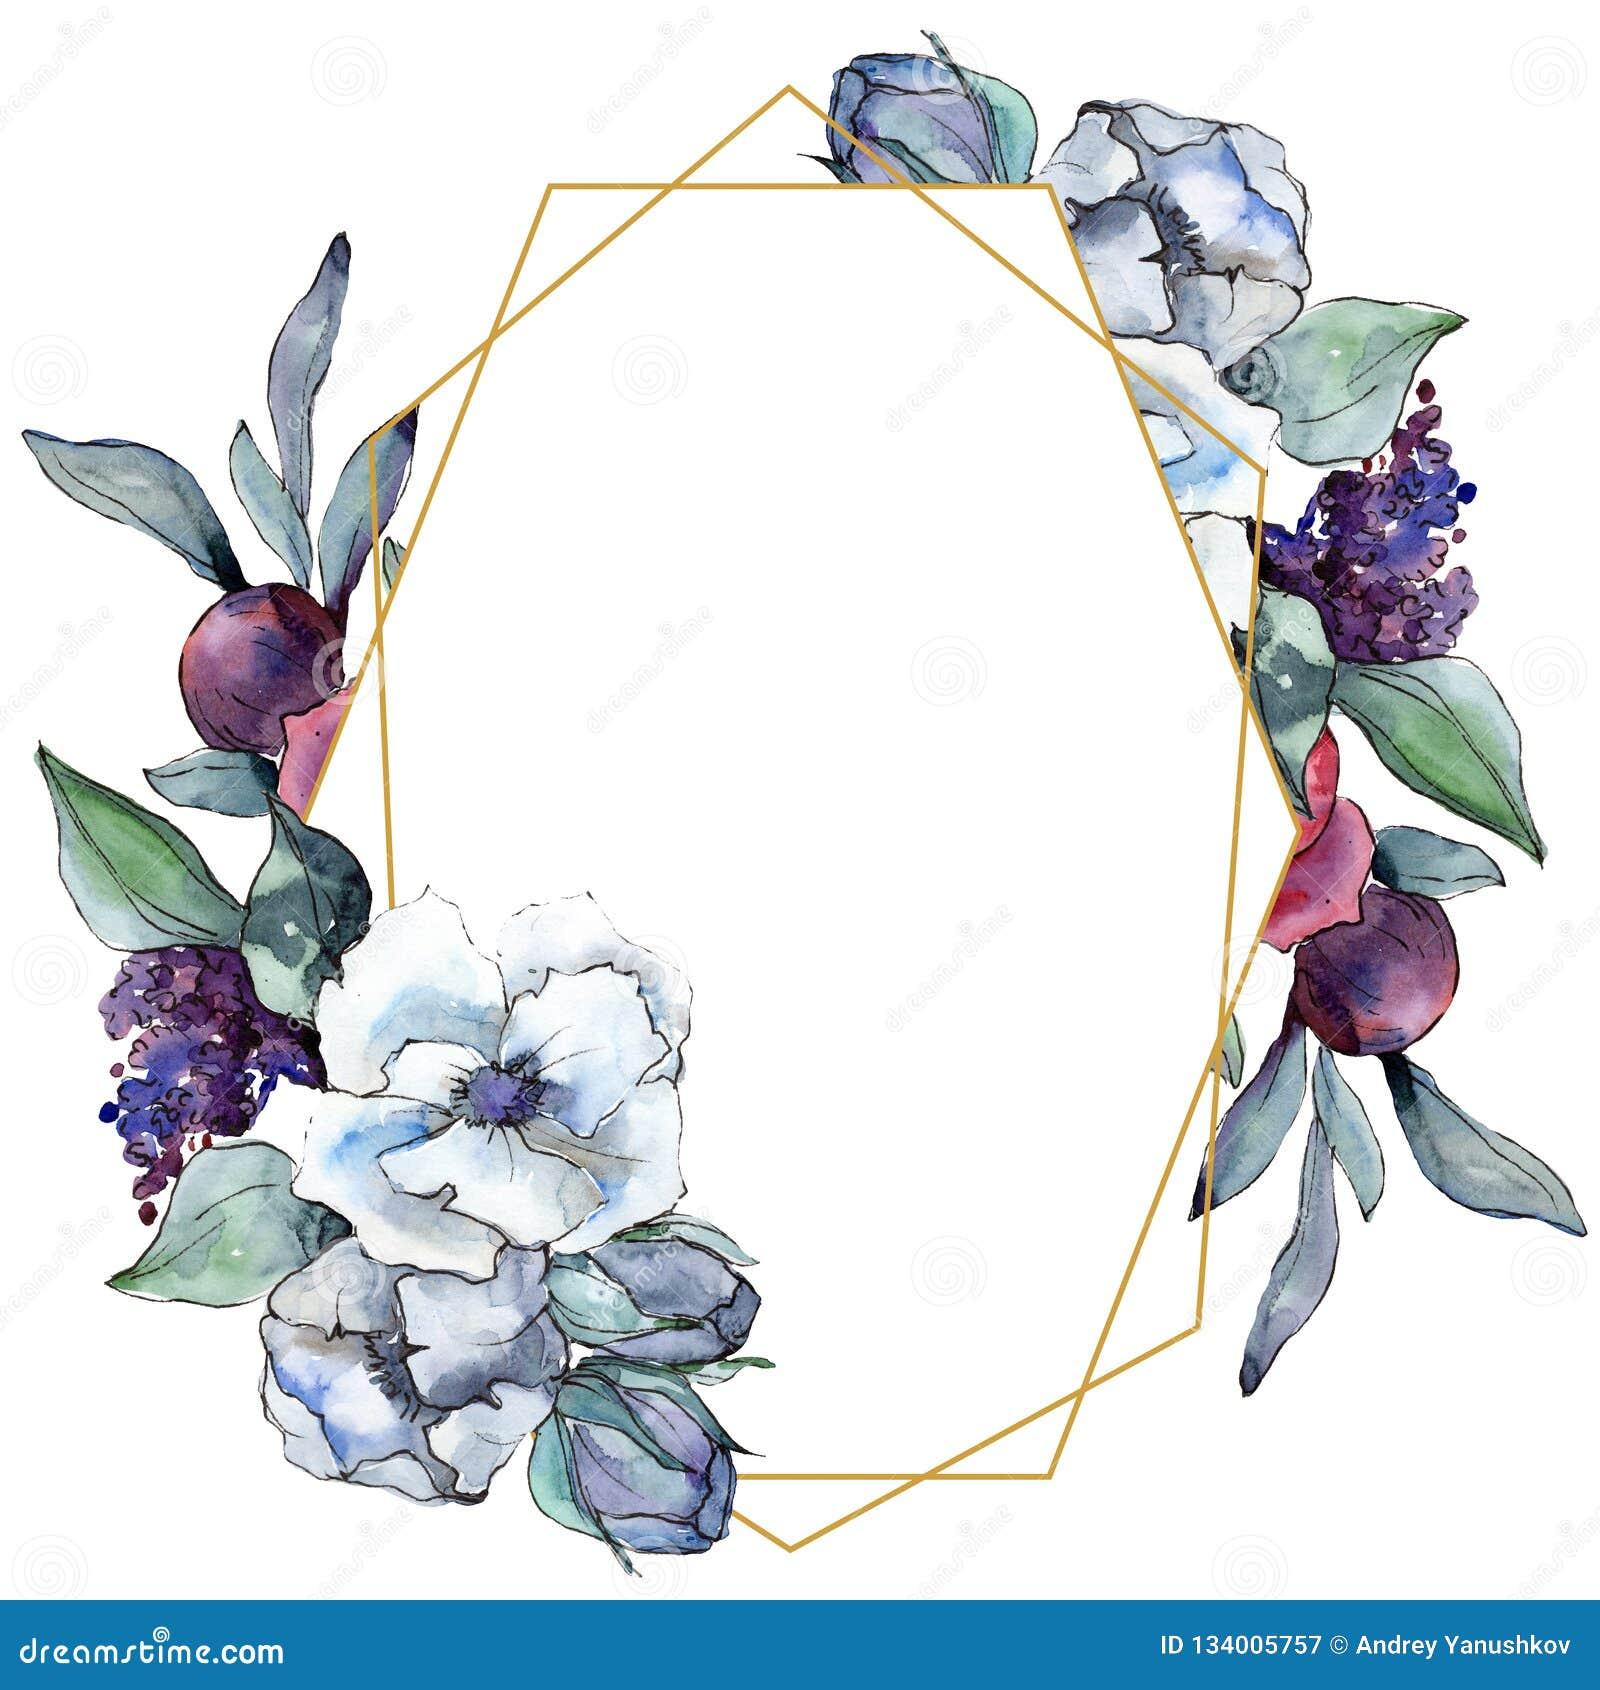 Bouquet Floral Flower Watercolor Background Illustration Set Watercolour Drawing Frame Border Ornament Square Stock Illustration Illustration Of Bouquet Meadow 134005757